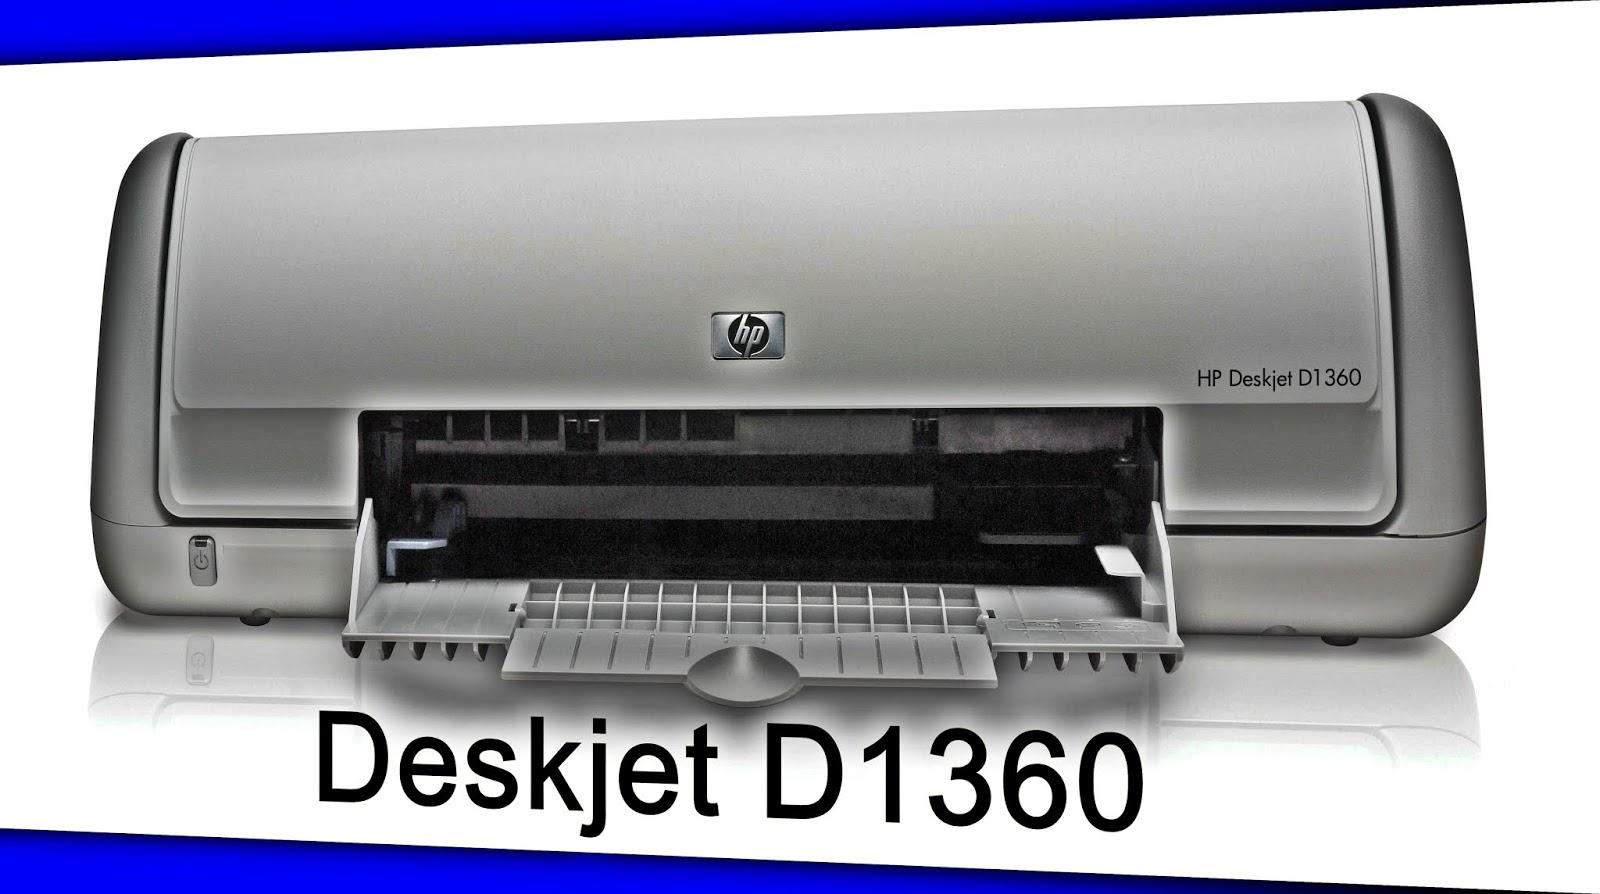 HP Deskjet D Driver Download for Windows 10 7 8/ - Drivers Update Center